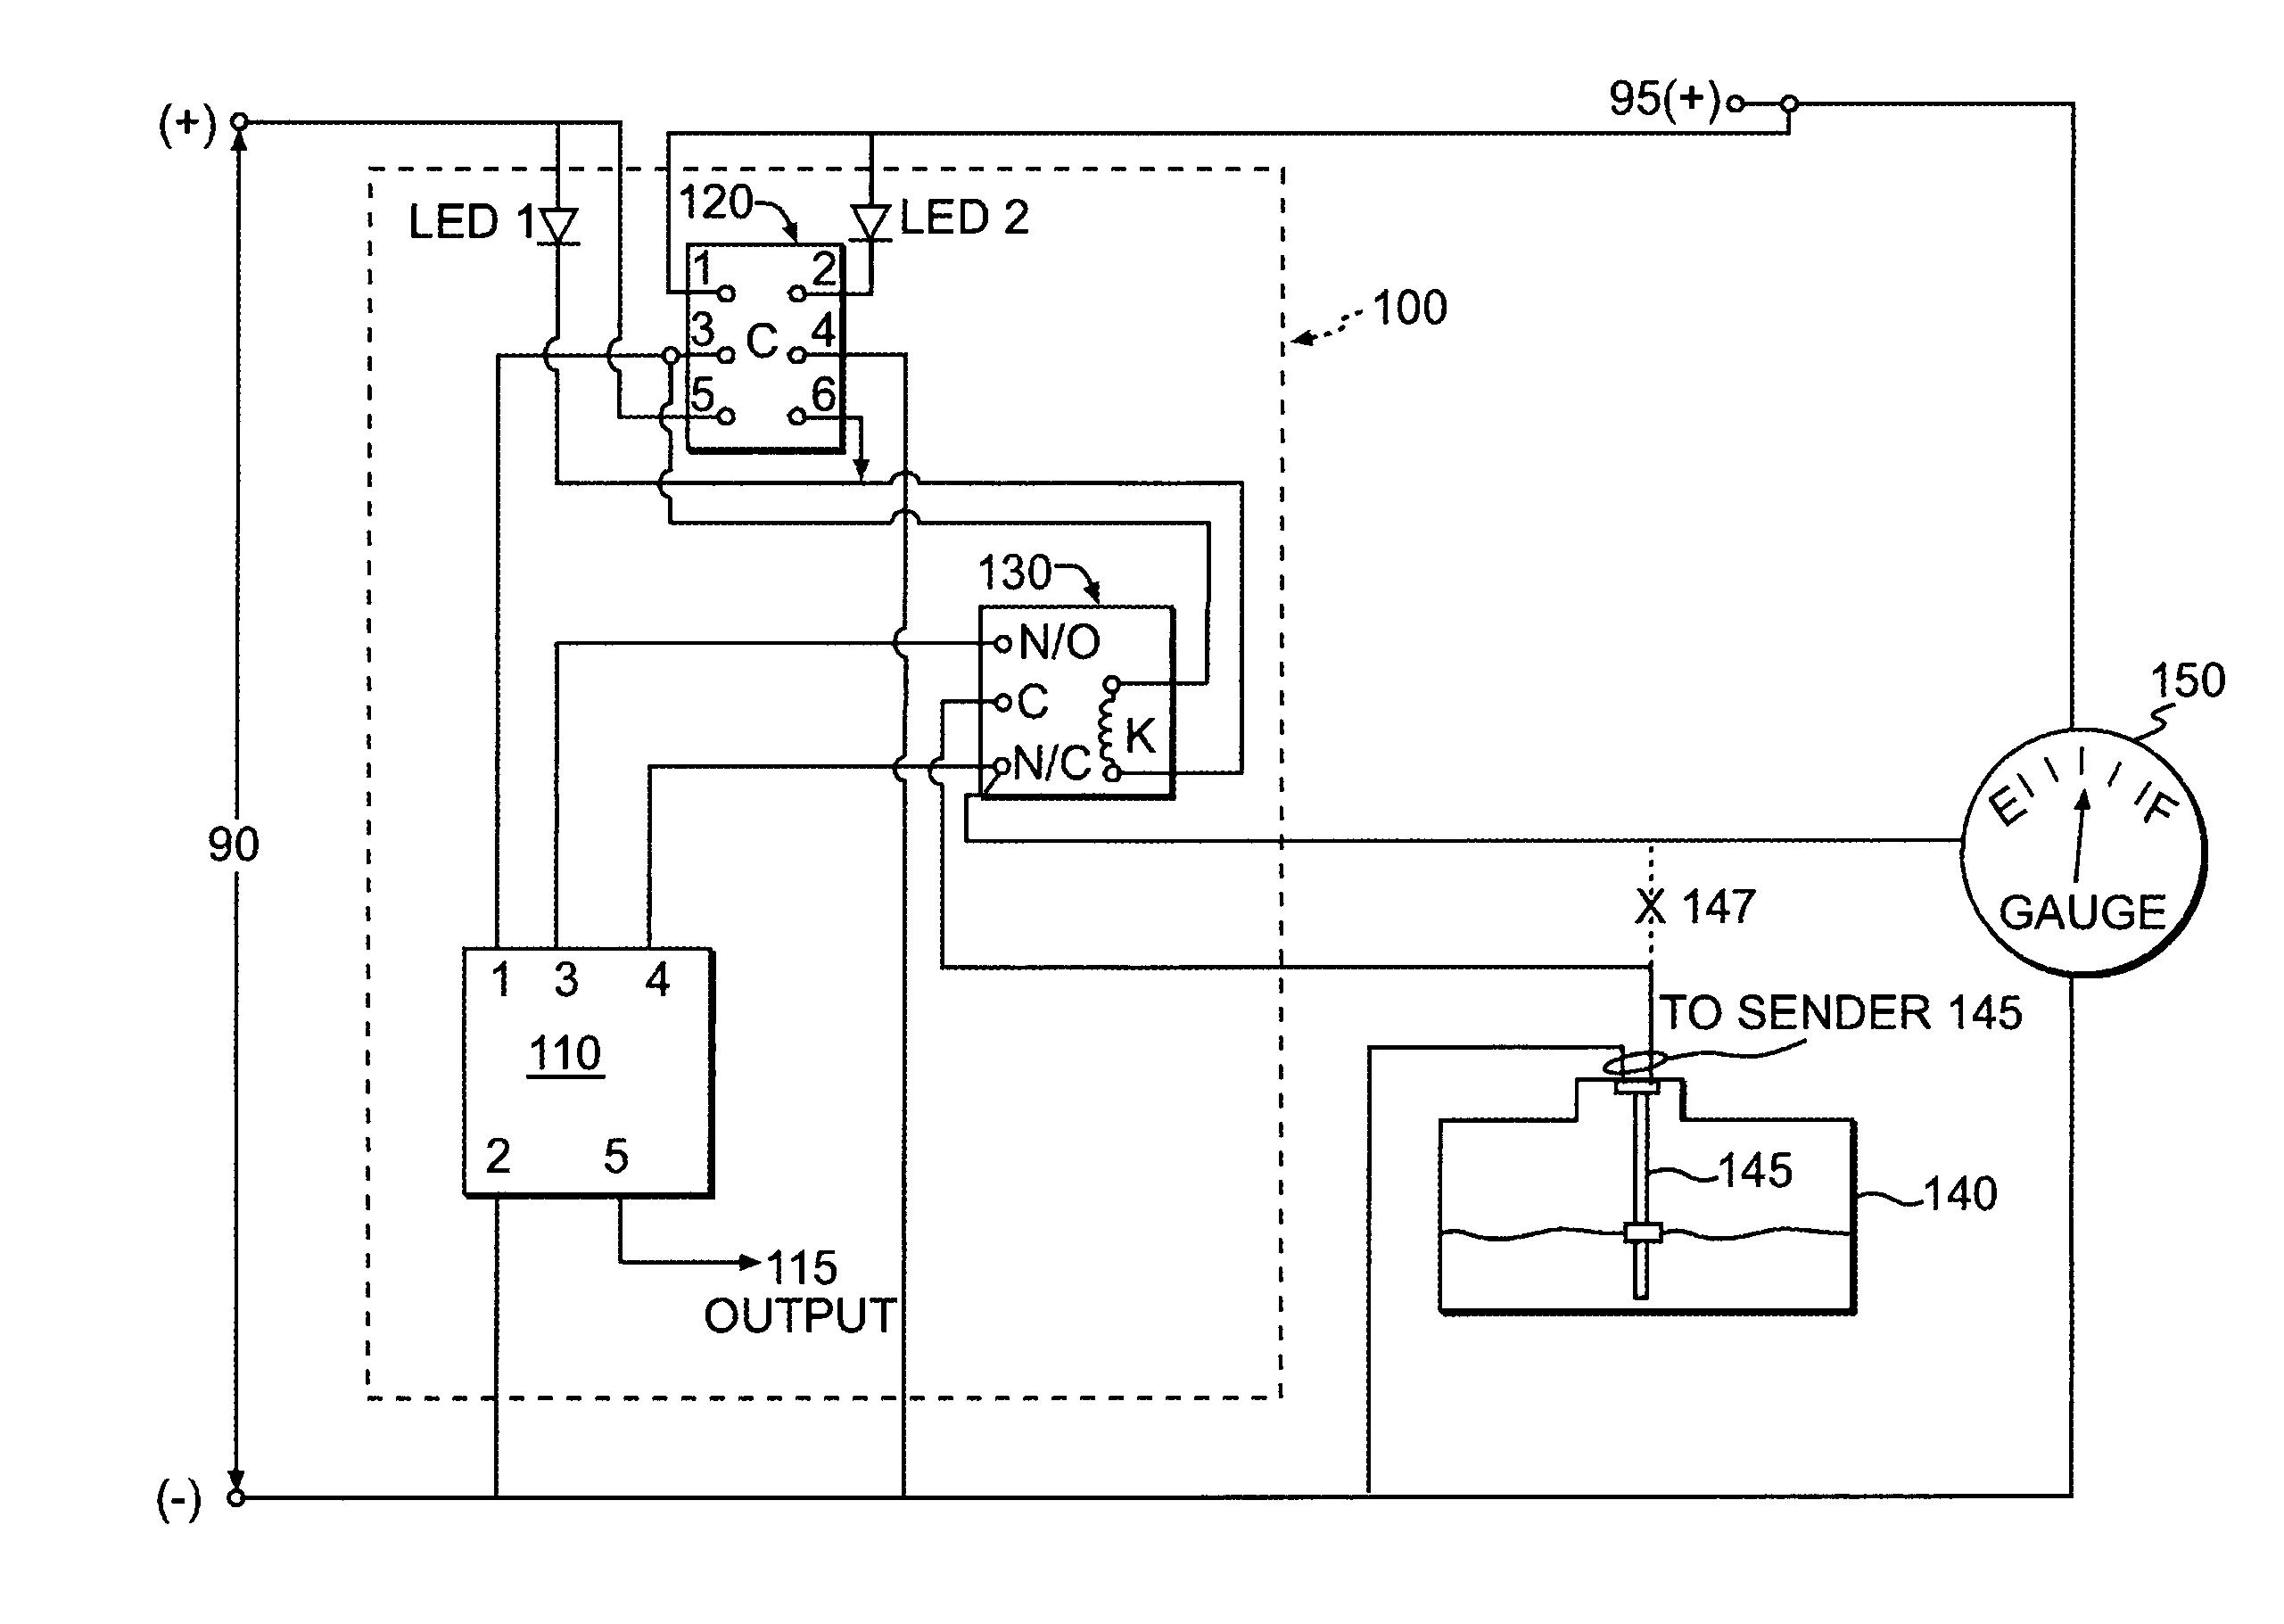 Sje Rhombus Wiring Diagram 26 Wiring Diagram Images